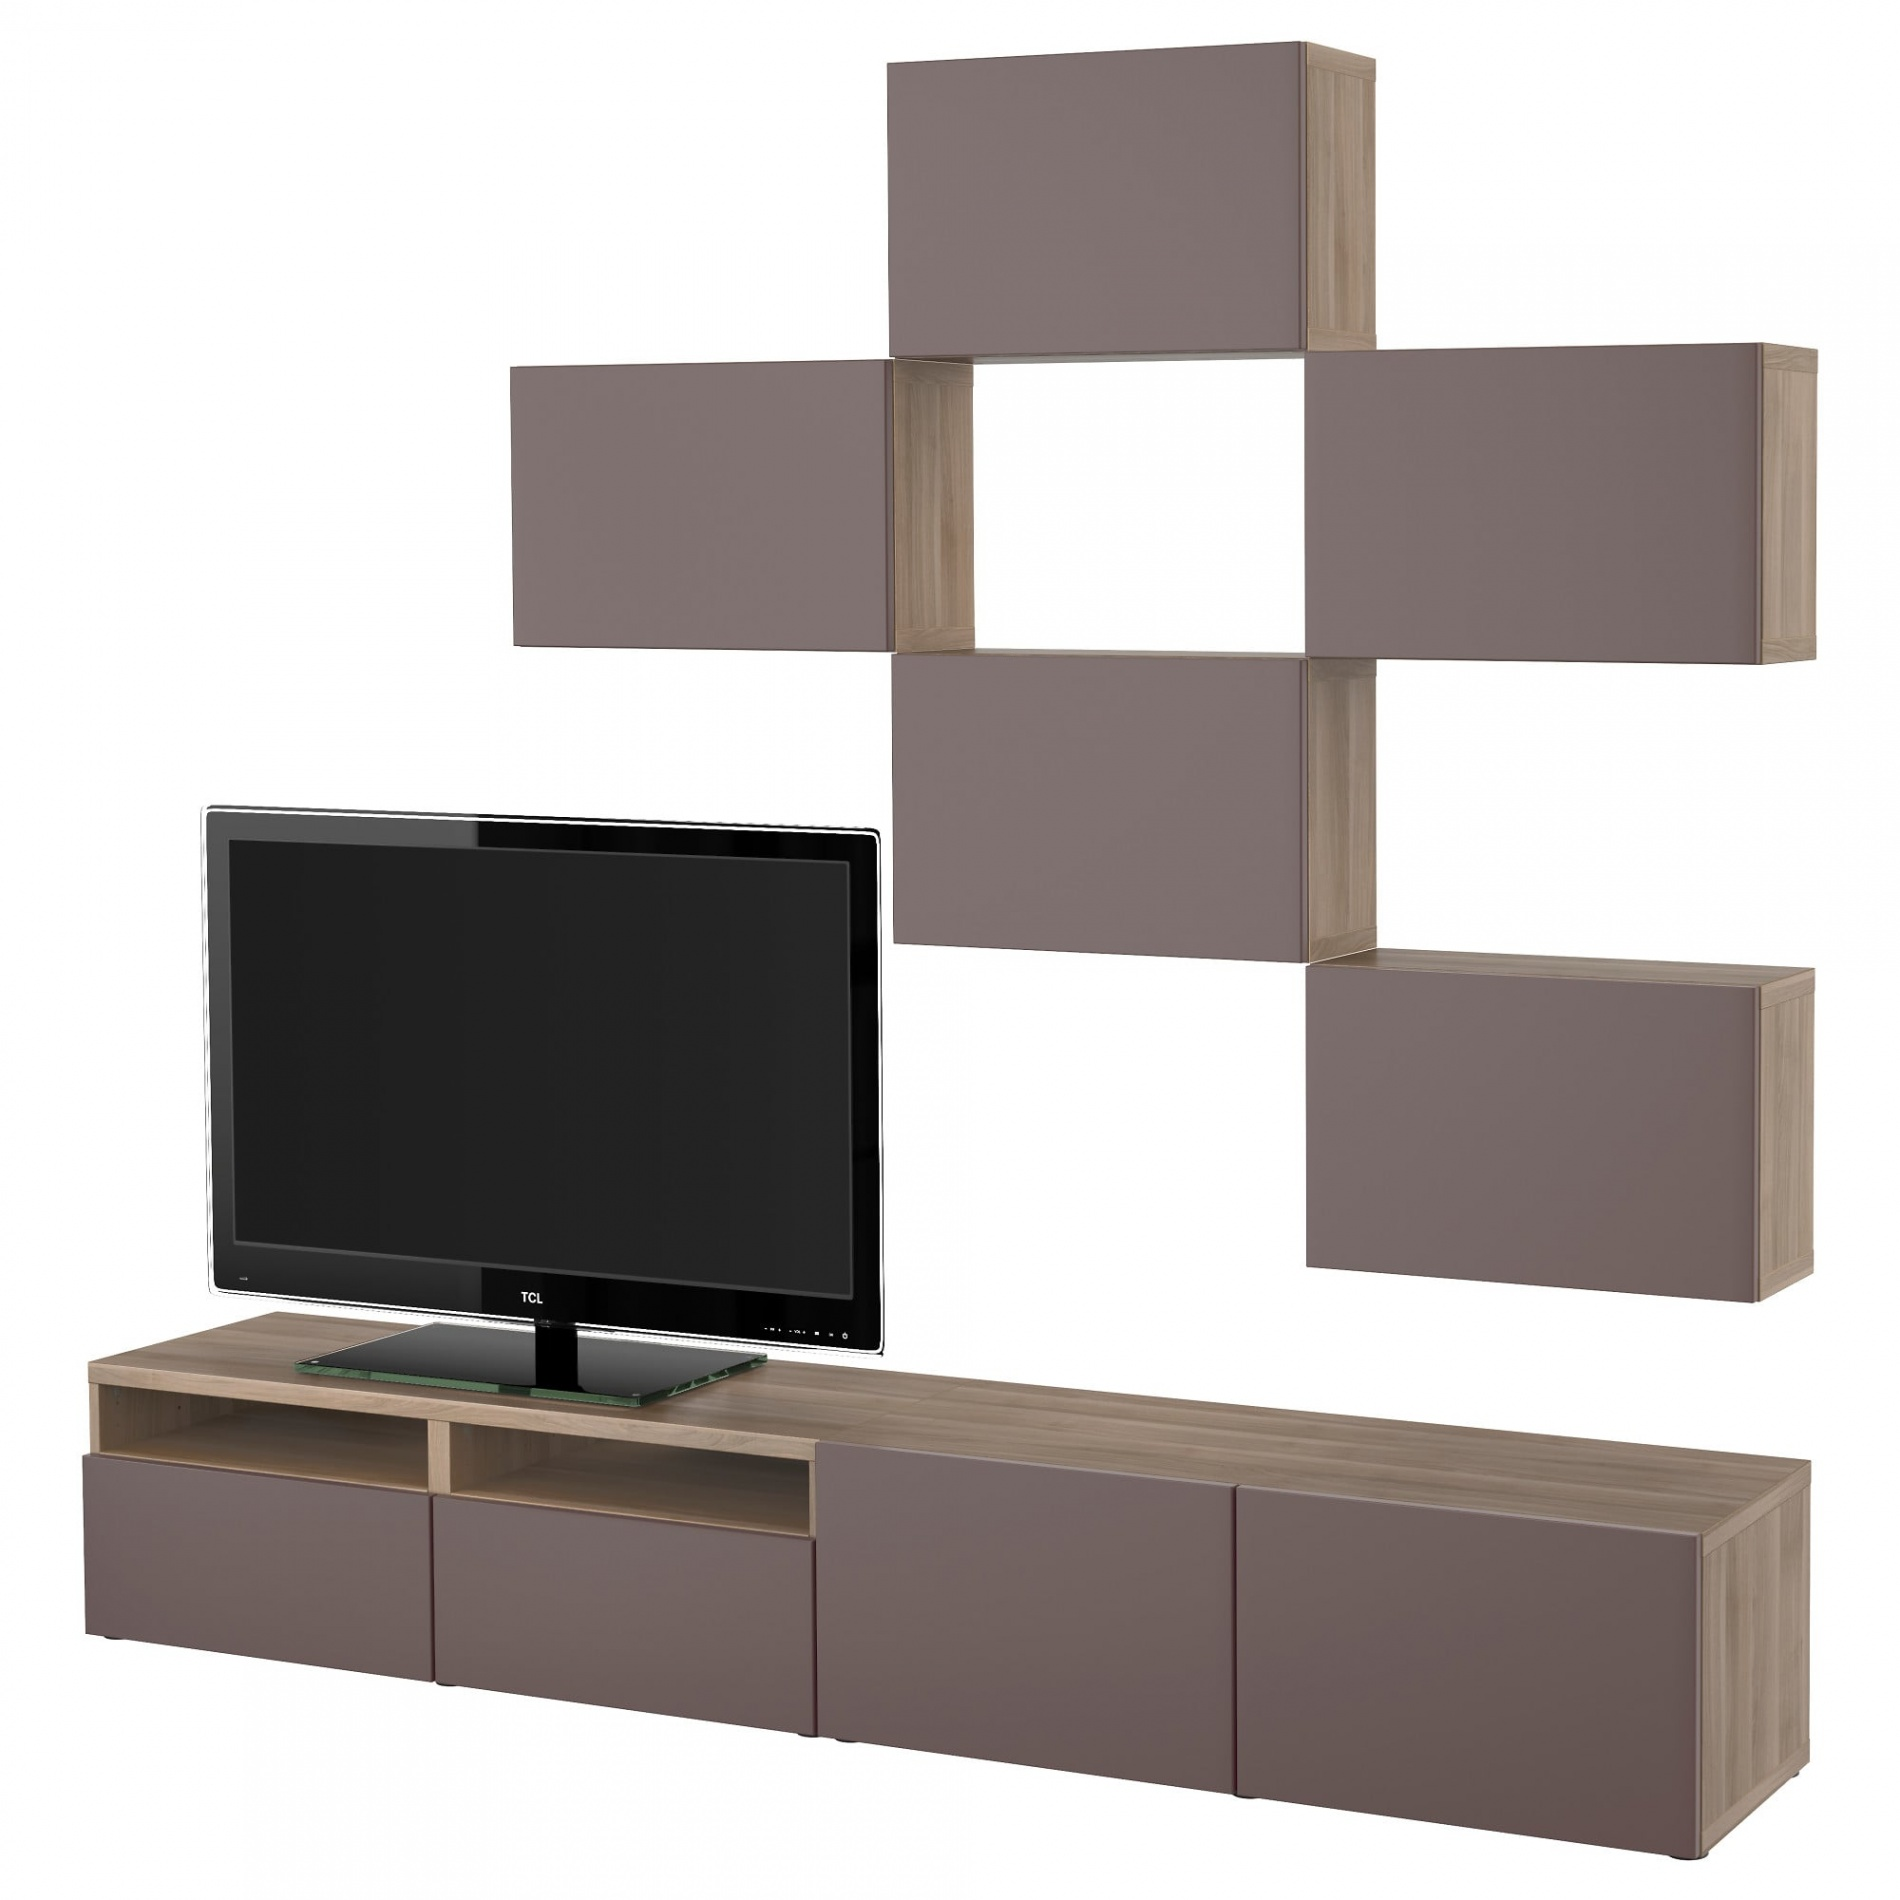 Meuble tv blanc design ikea